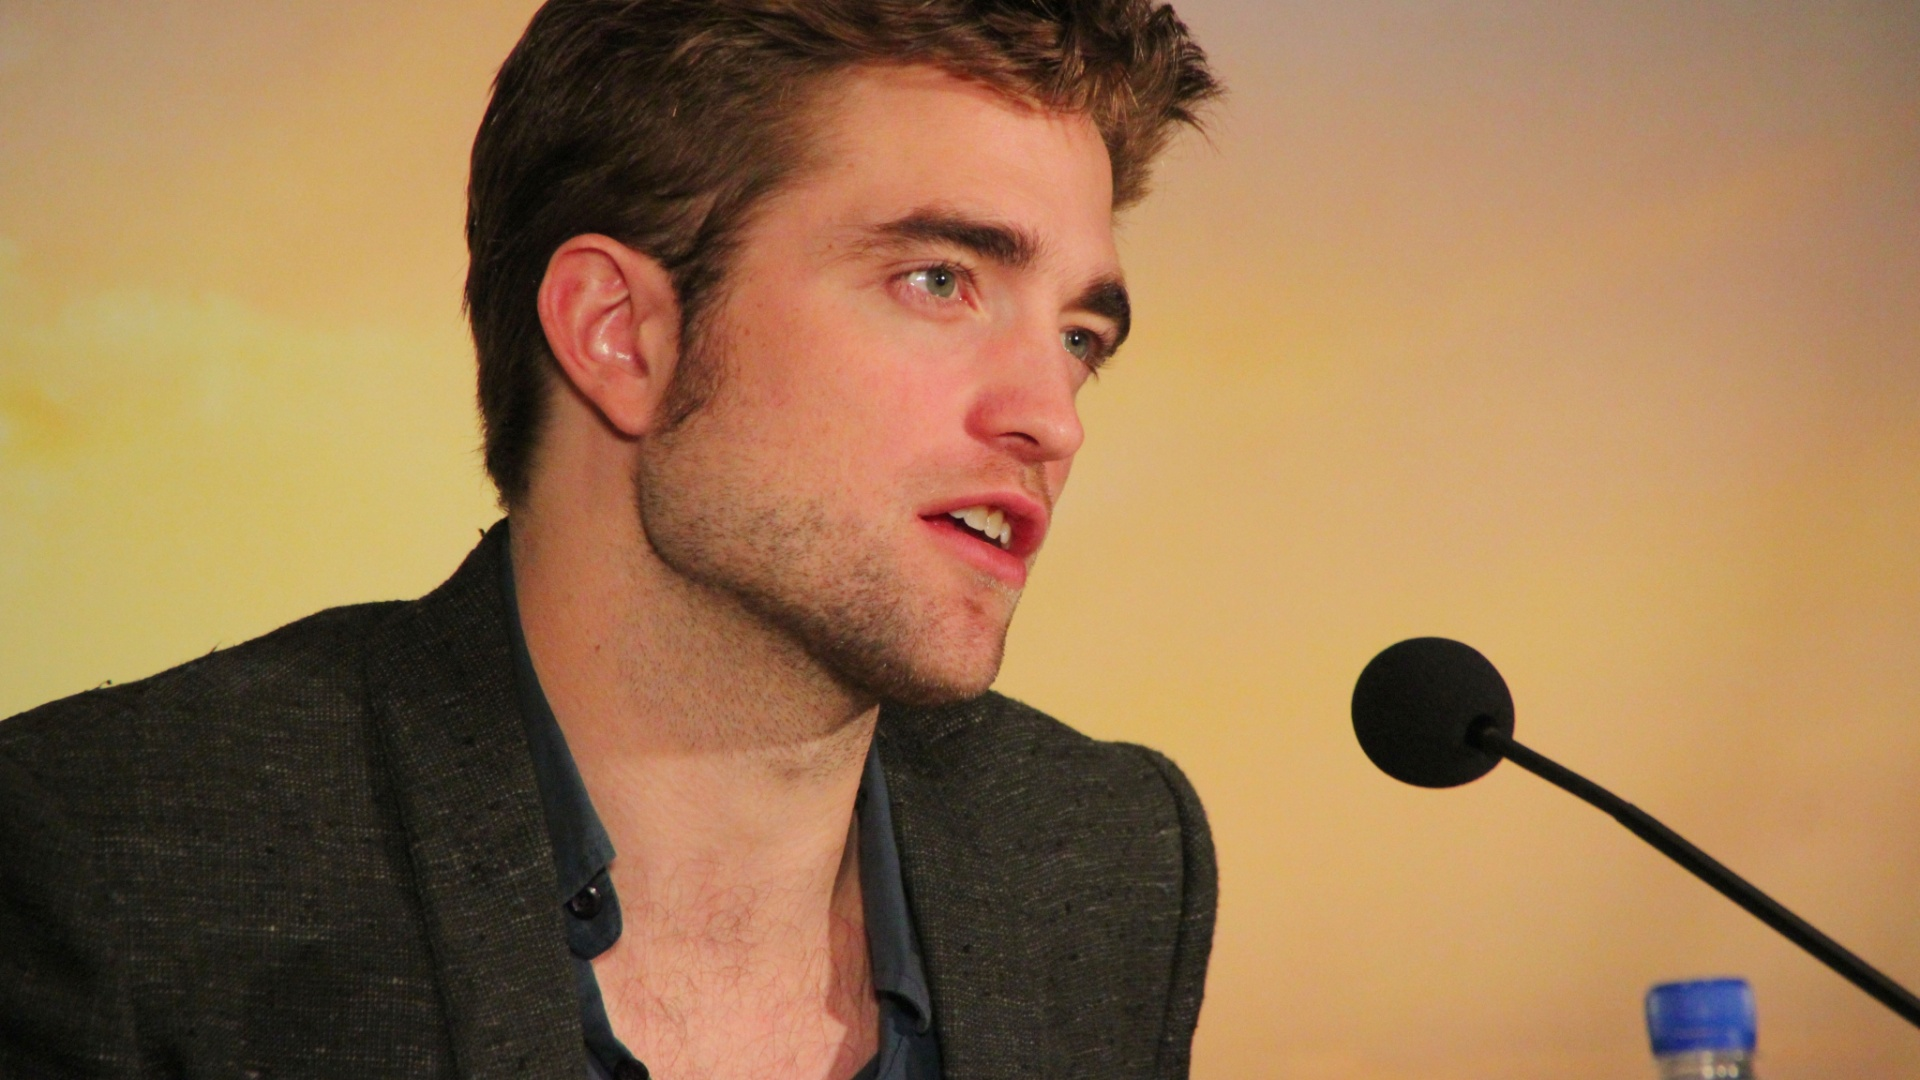 Robert Pattinson divulga